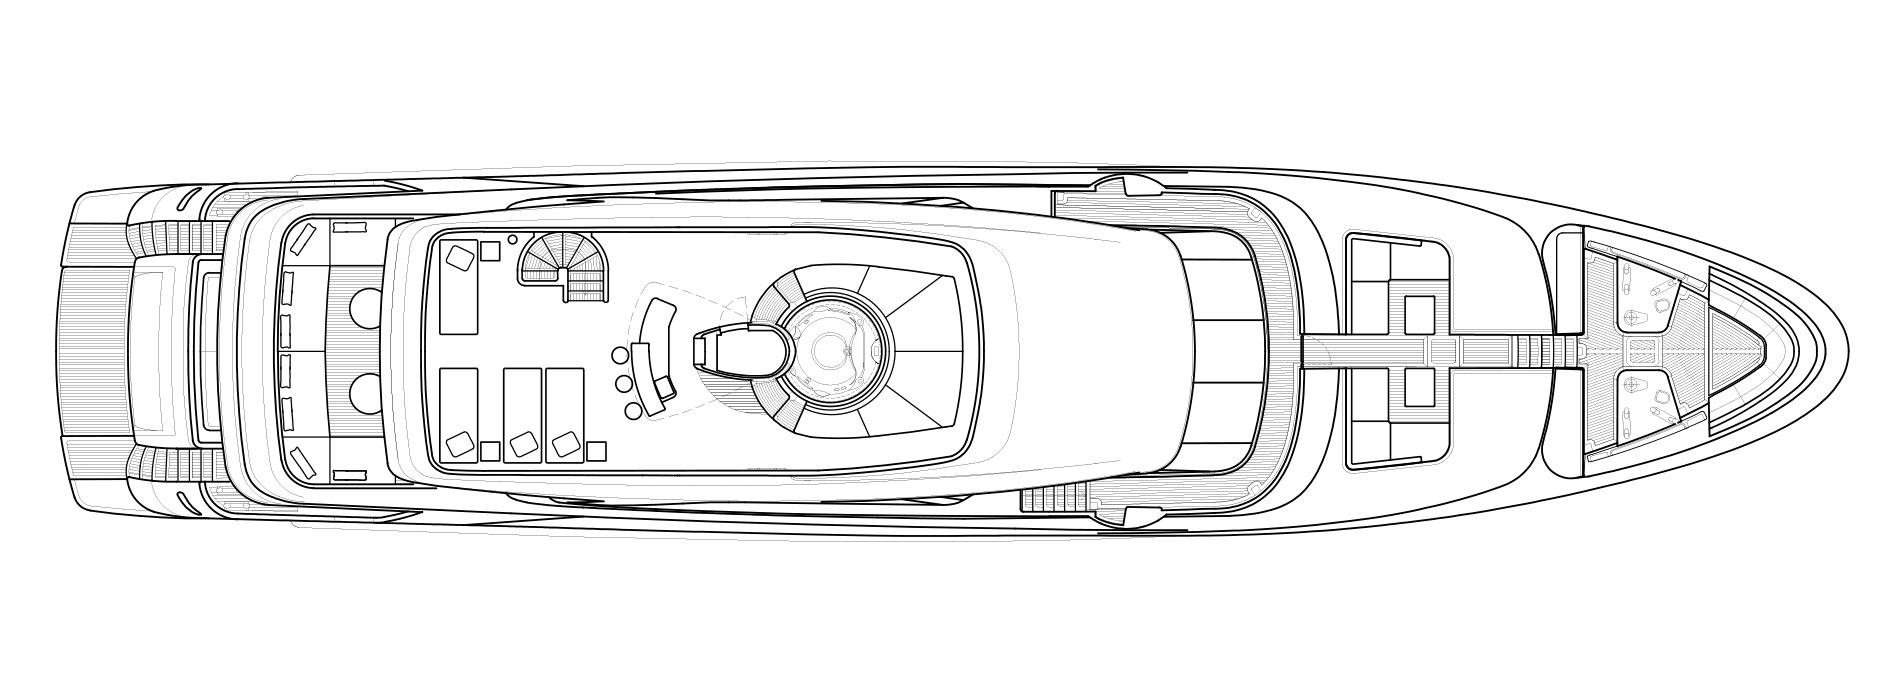 Sanlorenzo Yachts SD126 Флайбридж версия A